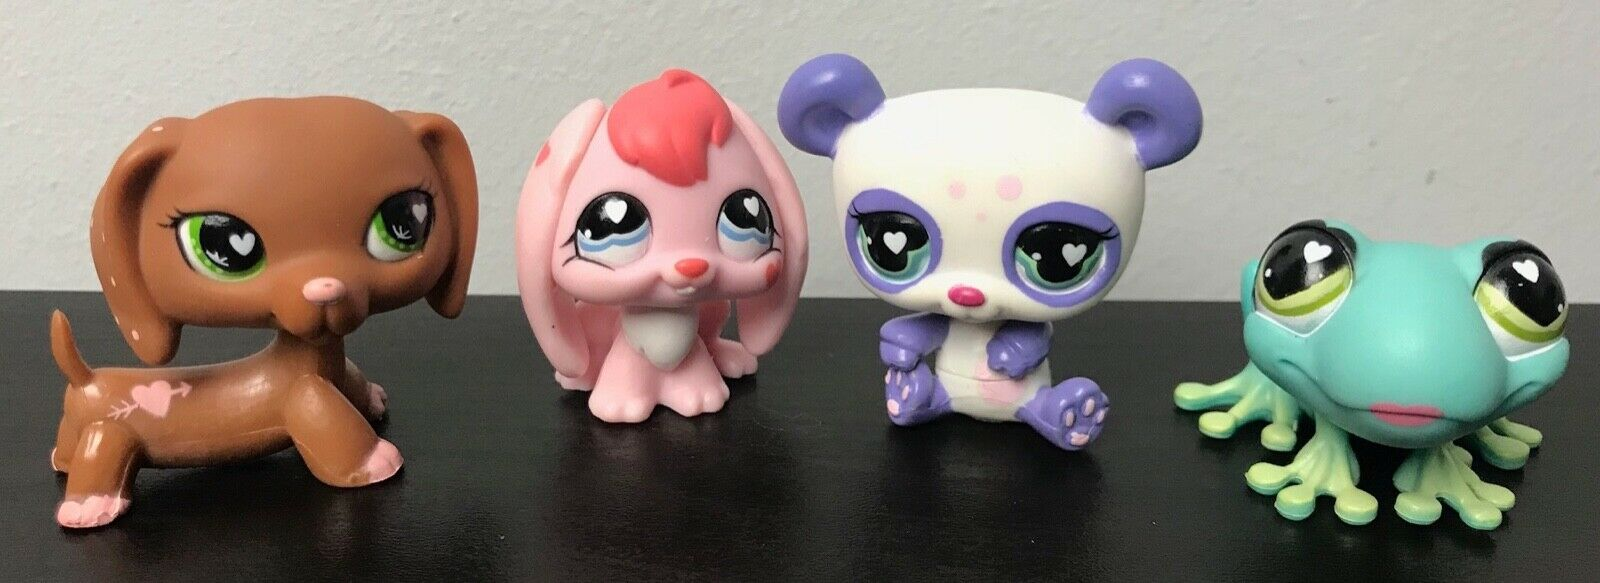 LPS Littlest Pet Shop Valentines Dachshund Bunny Frog Panda